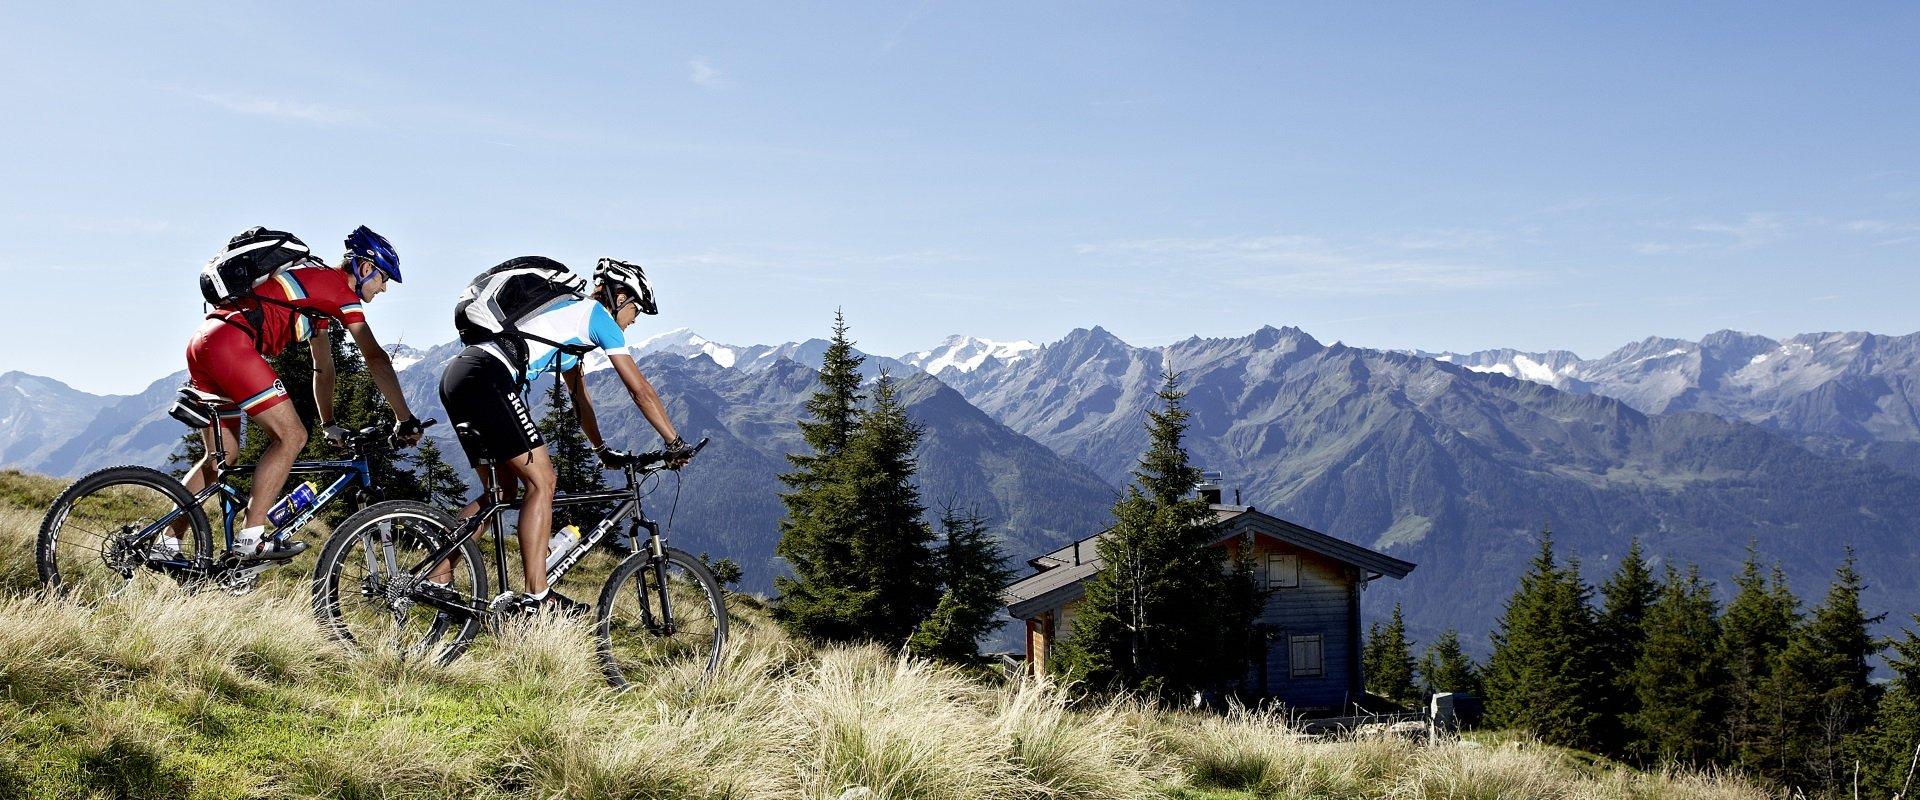 mountainbiken-kitzbuhler-alpen-oostenrijk.jpg